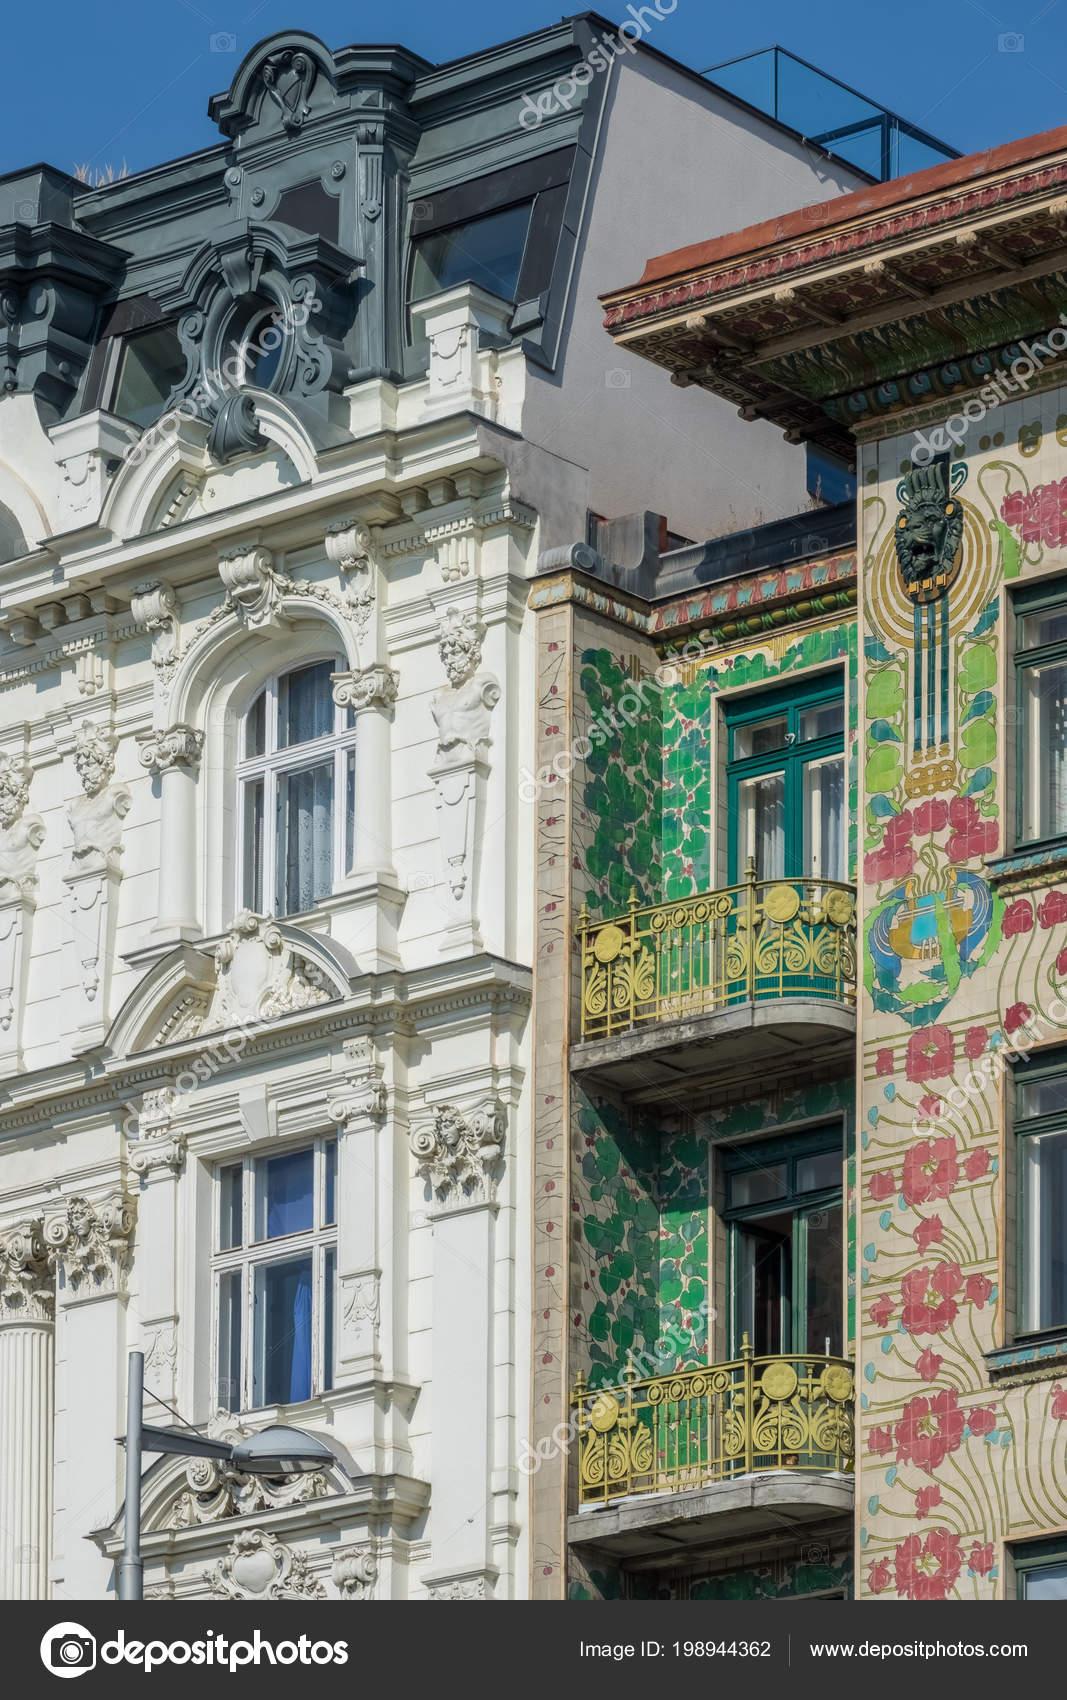 Architecture Vienna Art Nouveau Houses Wienzeile Architect Otto Wagner —  Stock Photo